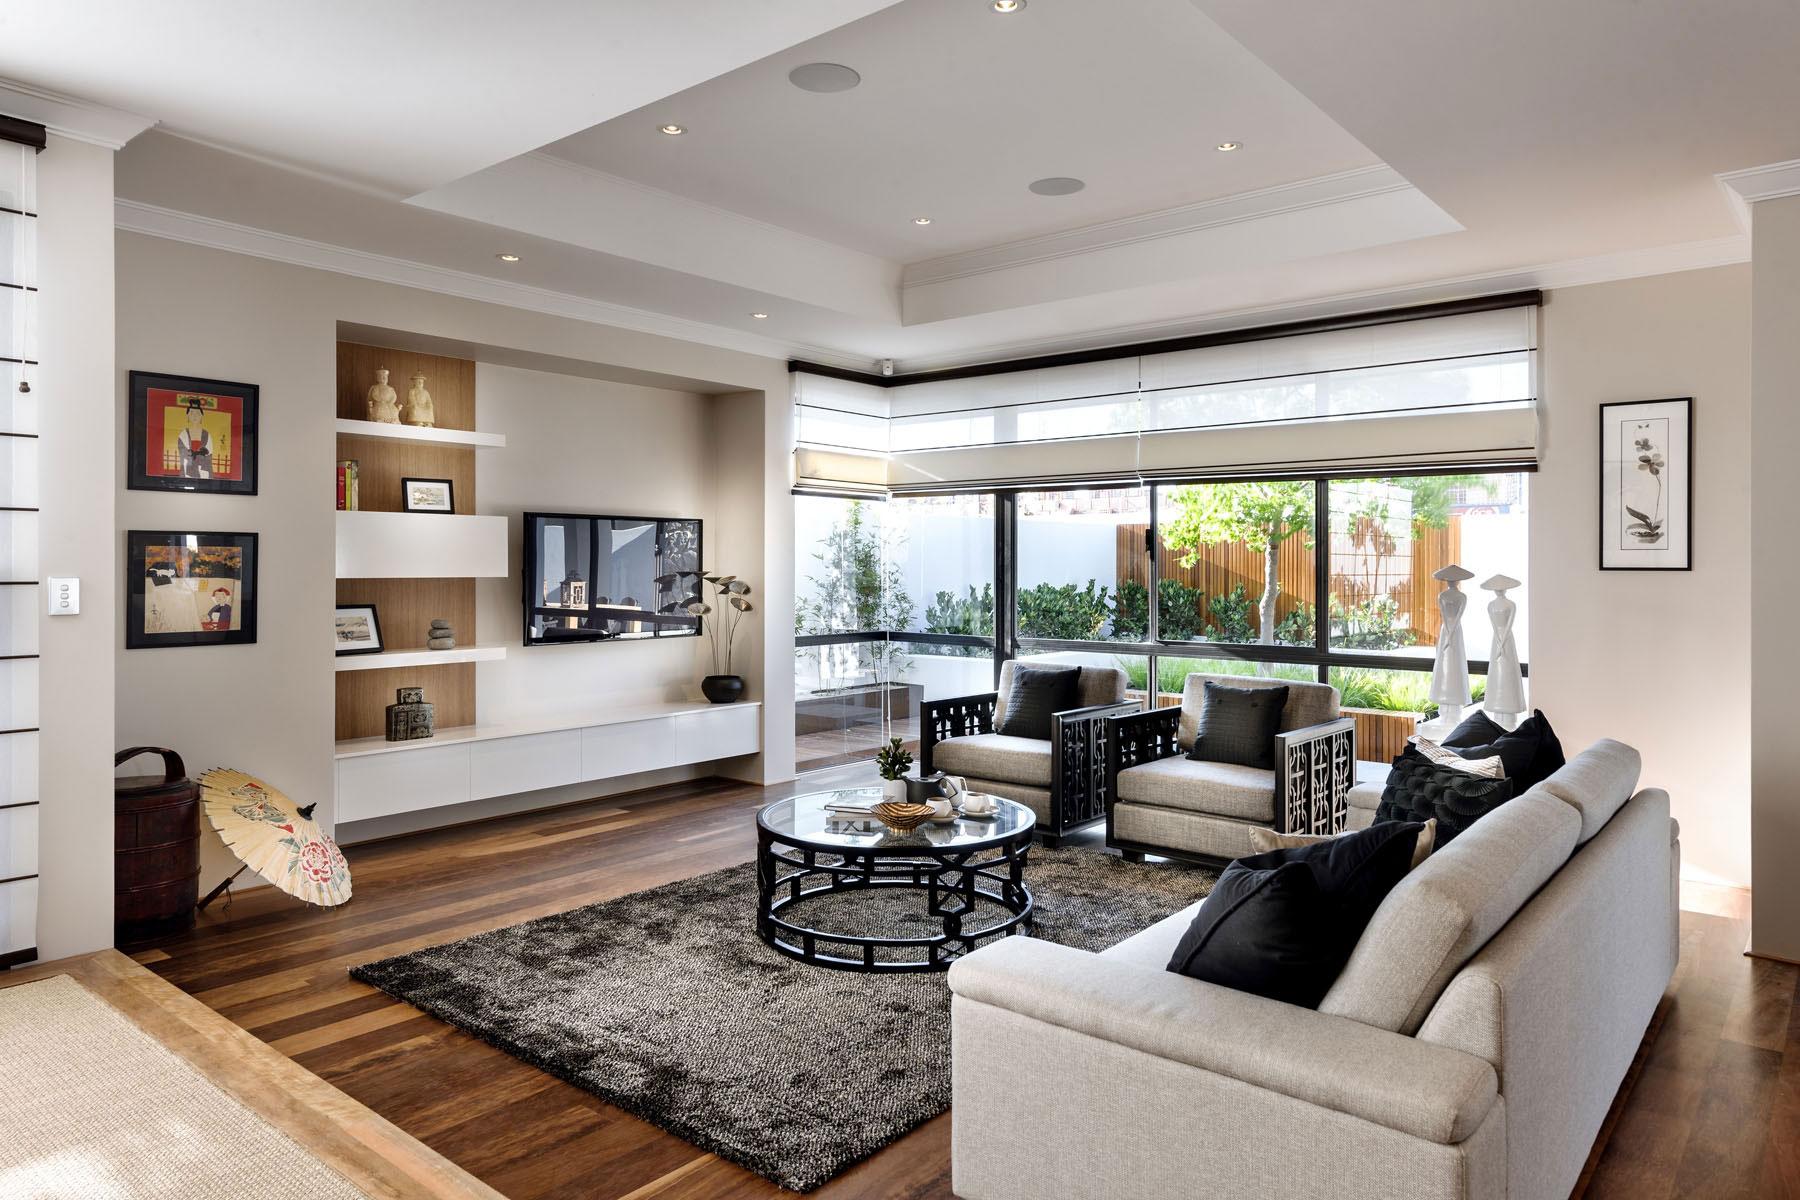 Sofas, Coffee Table, Rug, Wood Floor, House in Burns Beach, Perth